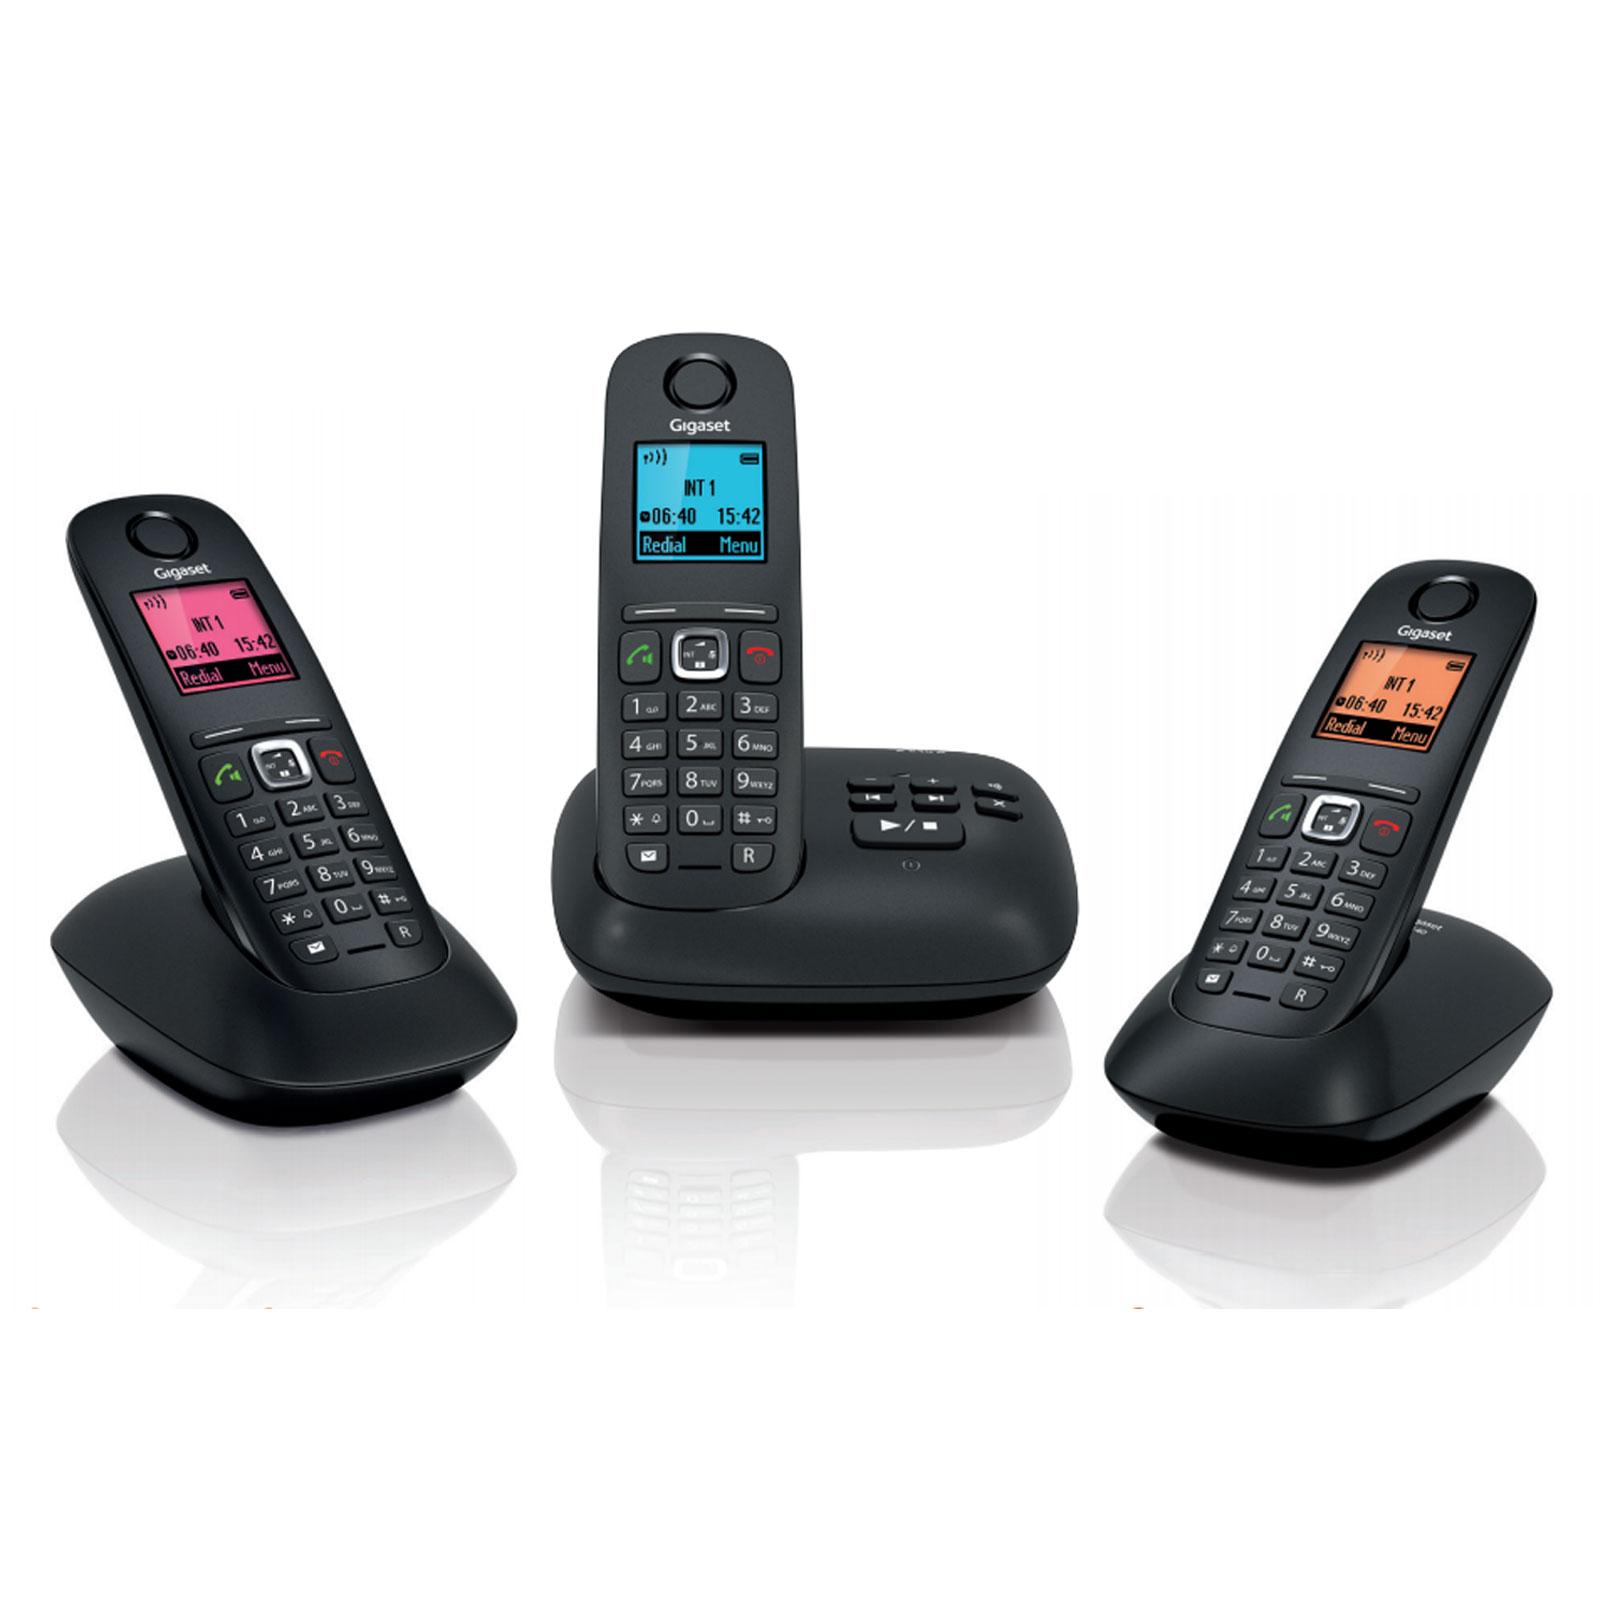 gigaset a540a trio noir t l phone sans fil gigaset sur. Black Bedroom Furniture Sets. Home Design Ideas